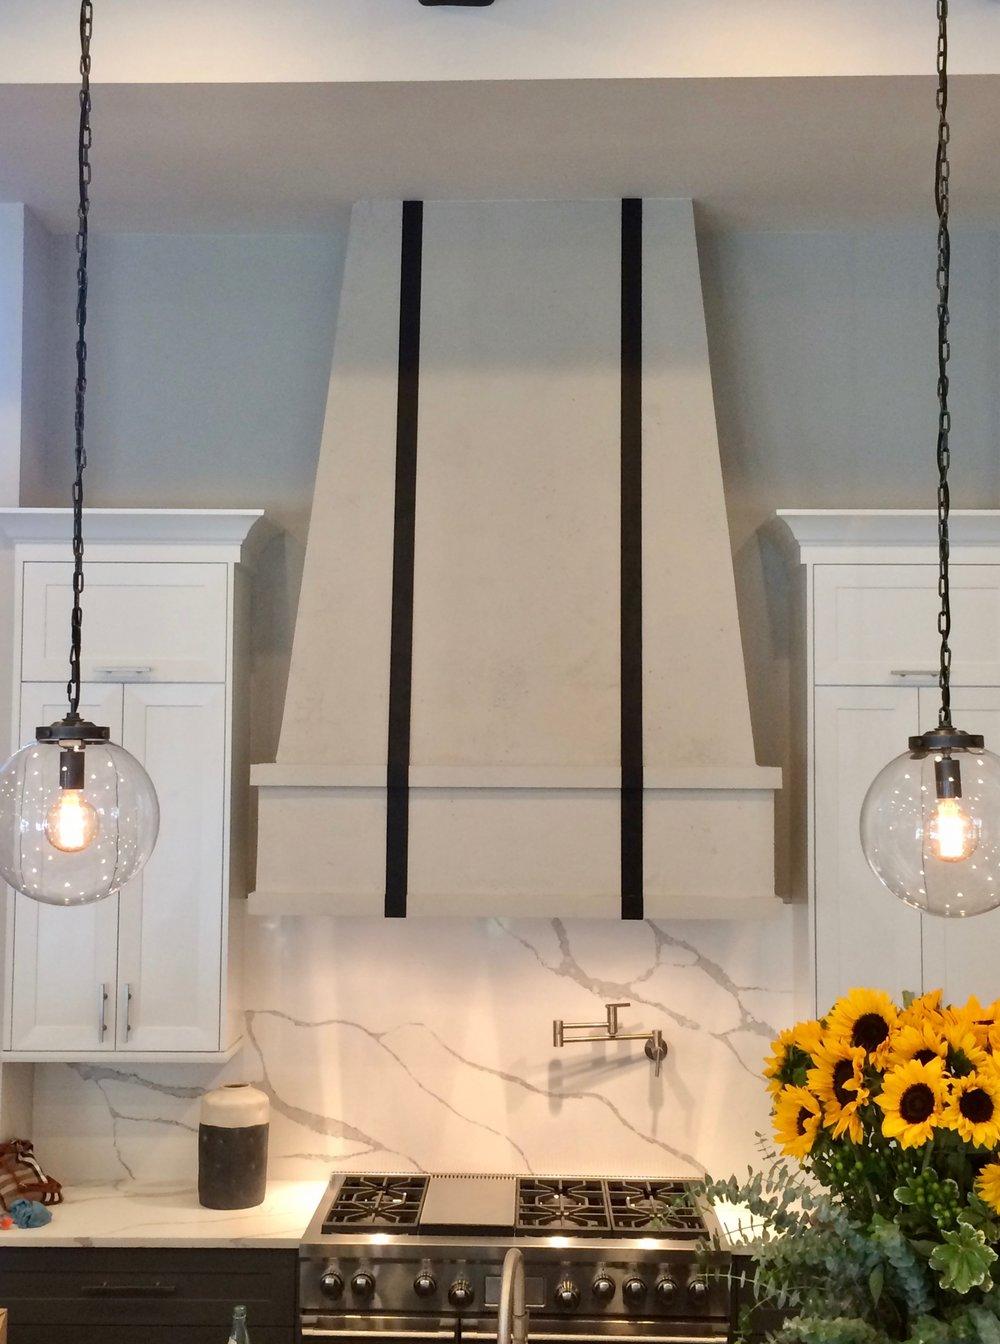 Limestone Hood Vent with Custom Metal Straps. Dimensions: 7.5'H x 5'W